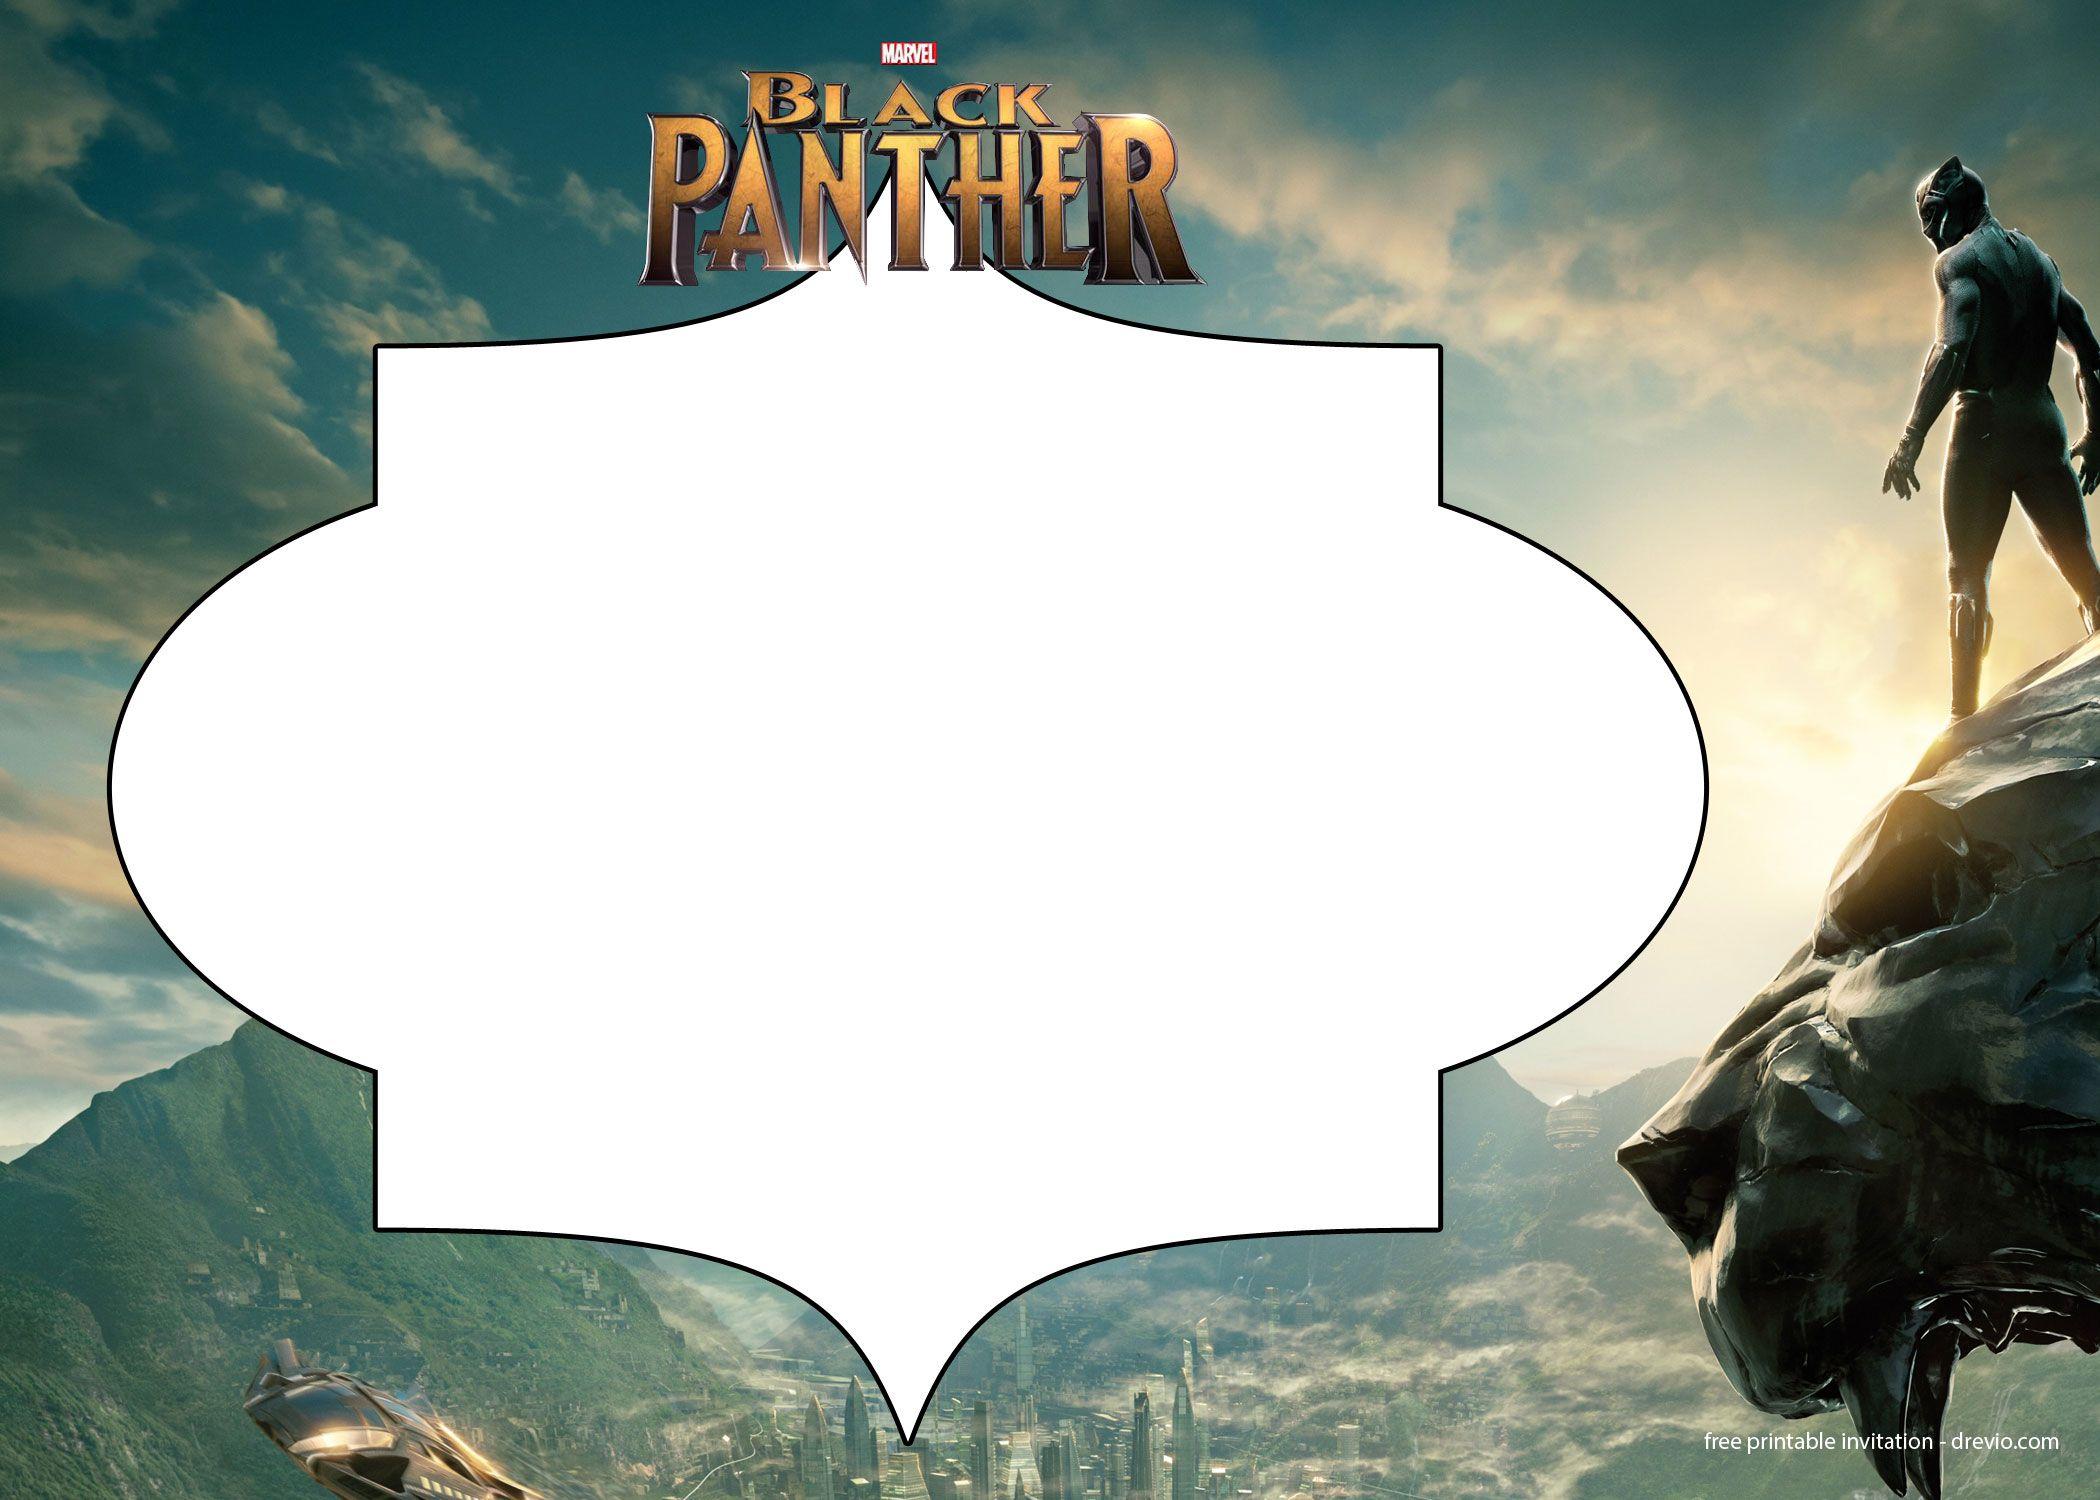 FREE Printable Black Panther Invitation Templates | Free Printable ...